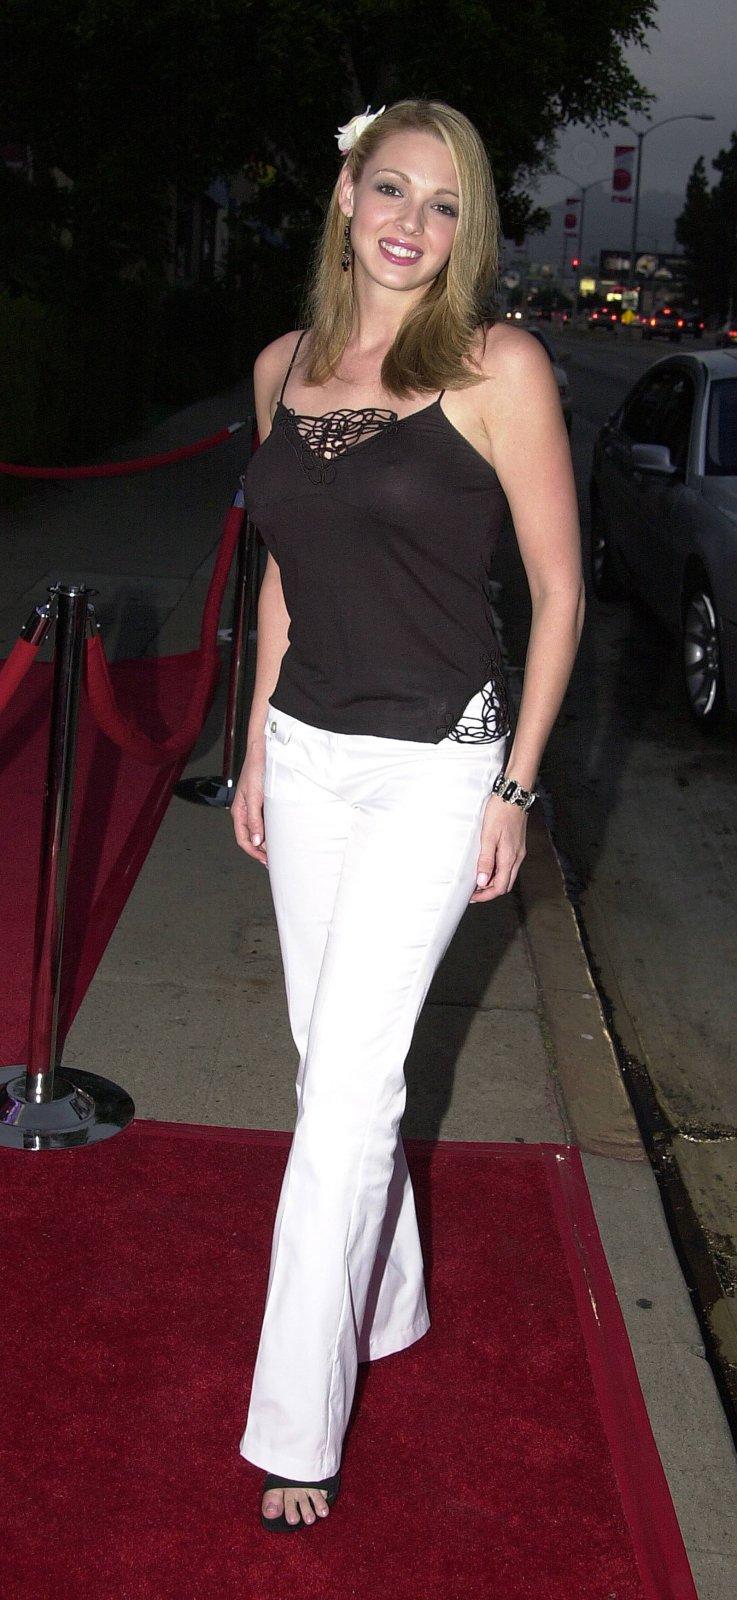 Angela Dodson Net Worth